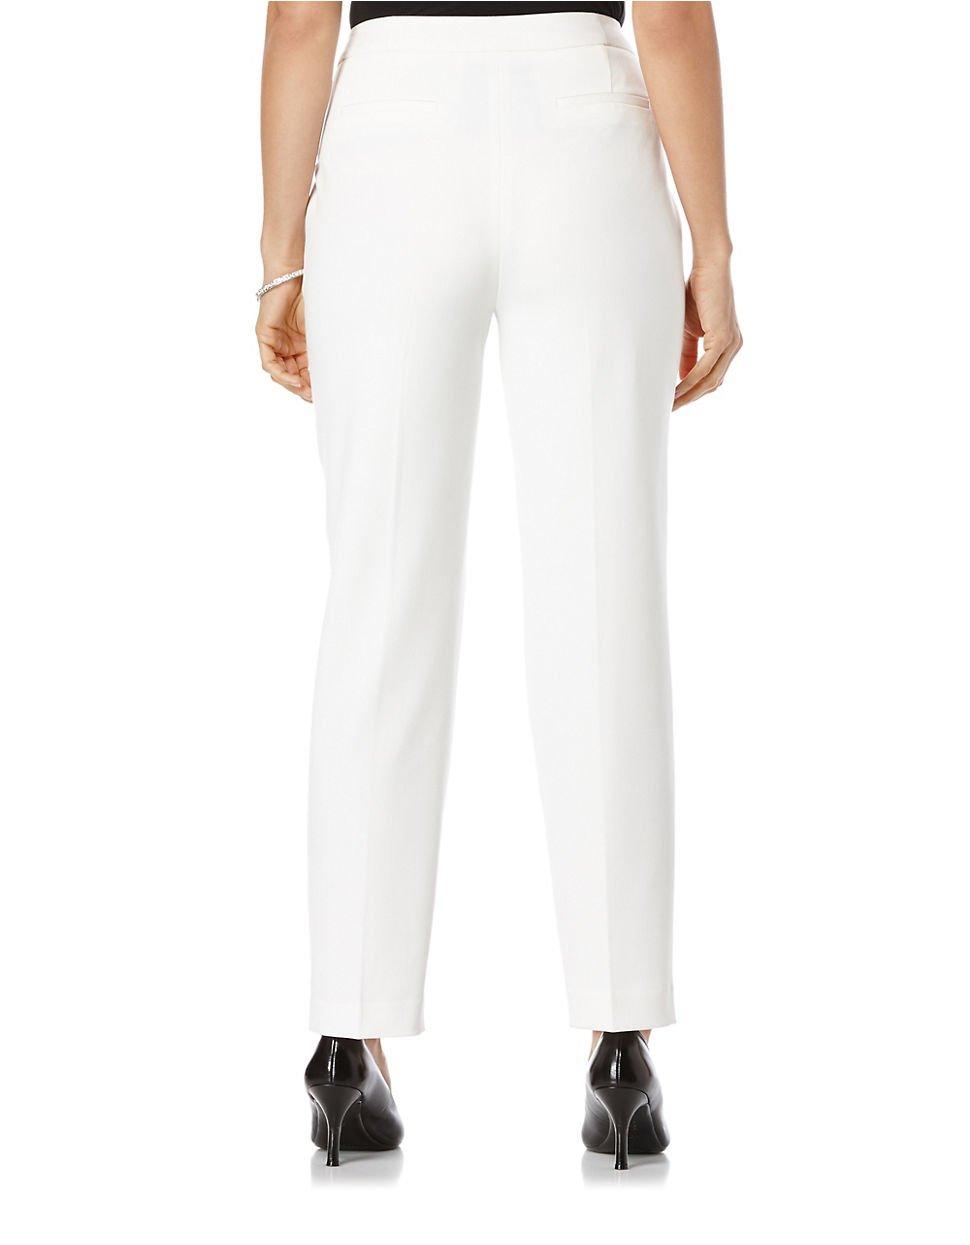 Rafaella Petite Fashion Gab Curvy Fit Pants In White Lyst